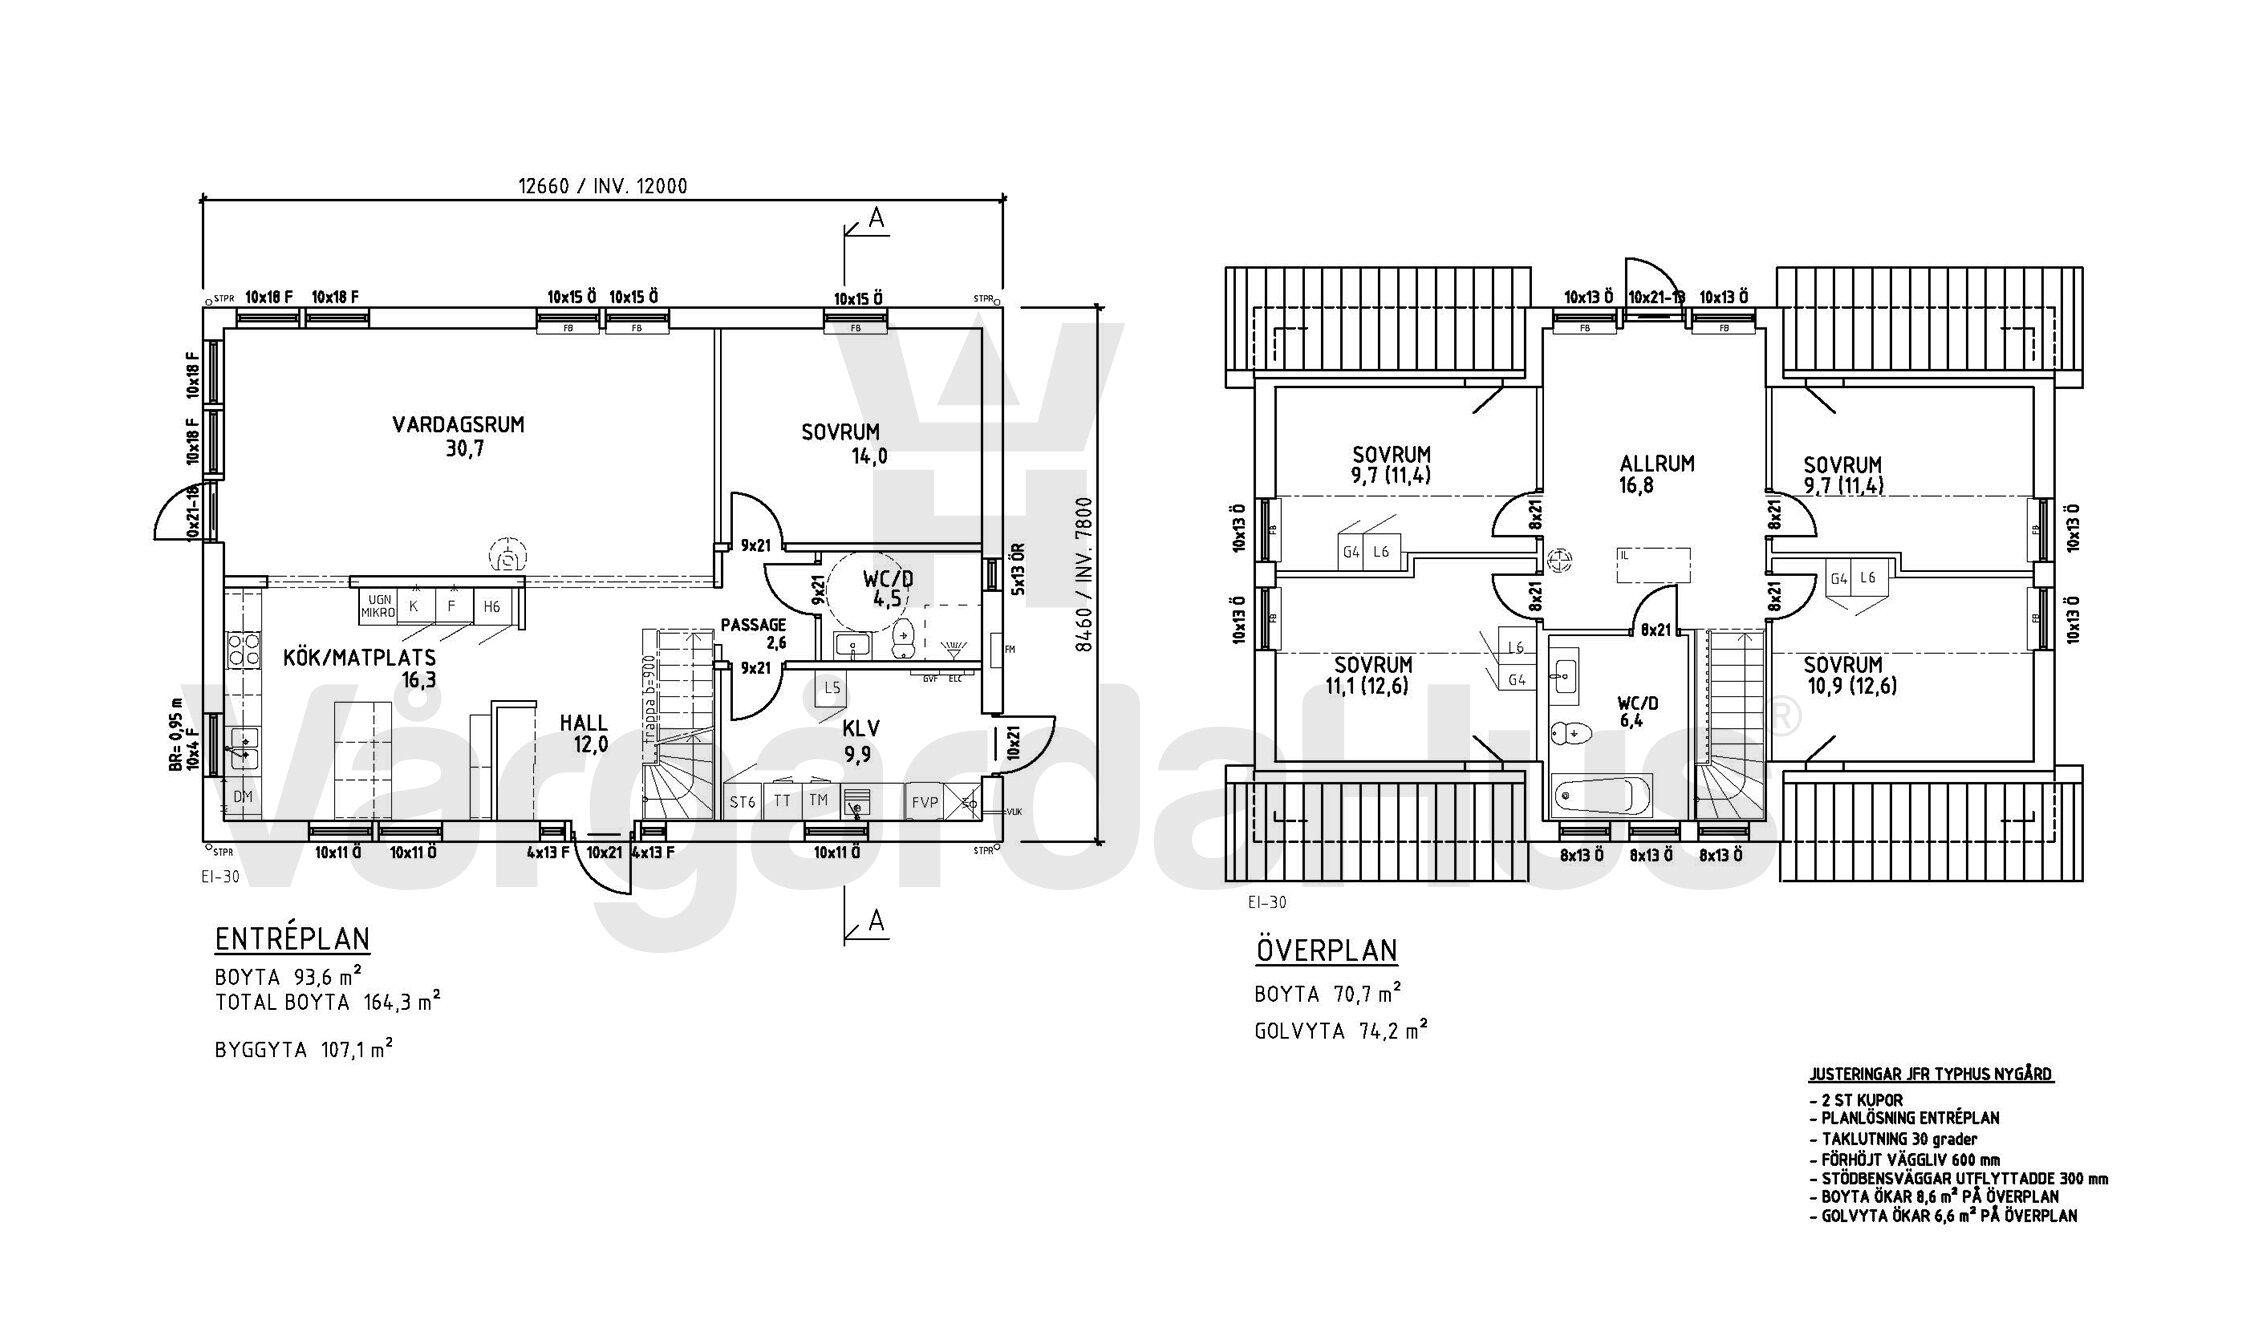 5202-planlosning.jpg